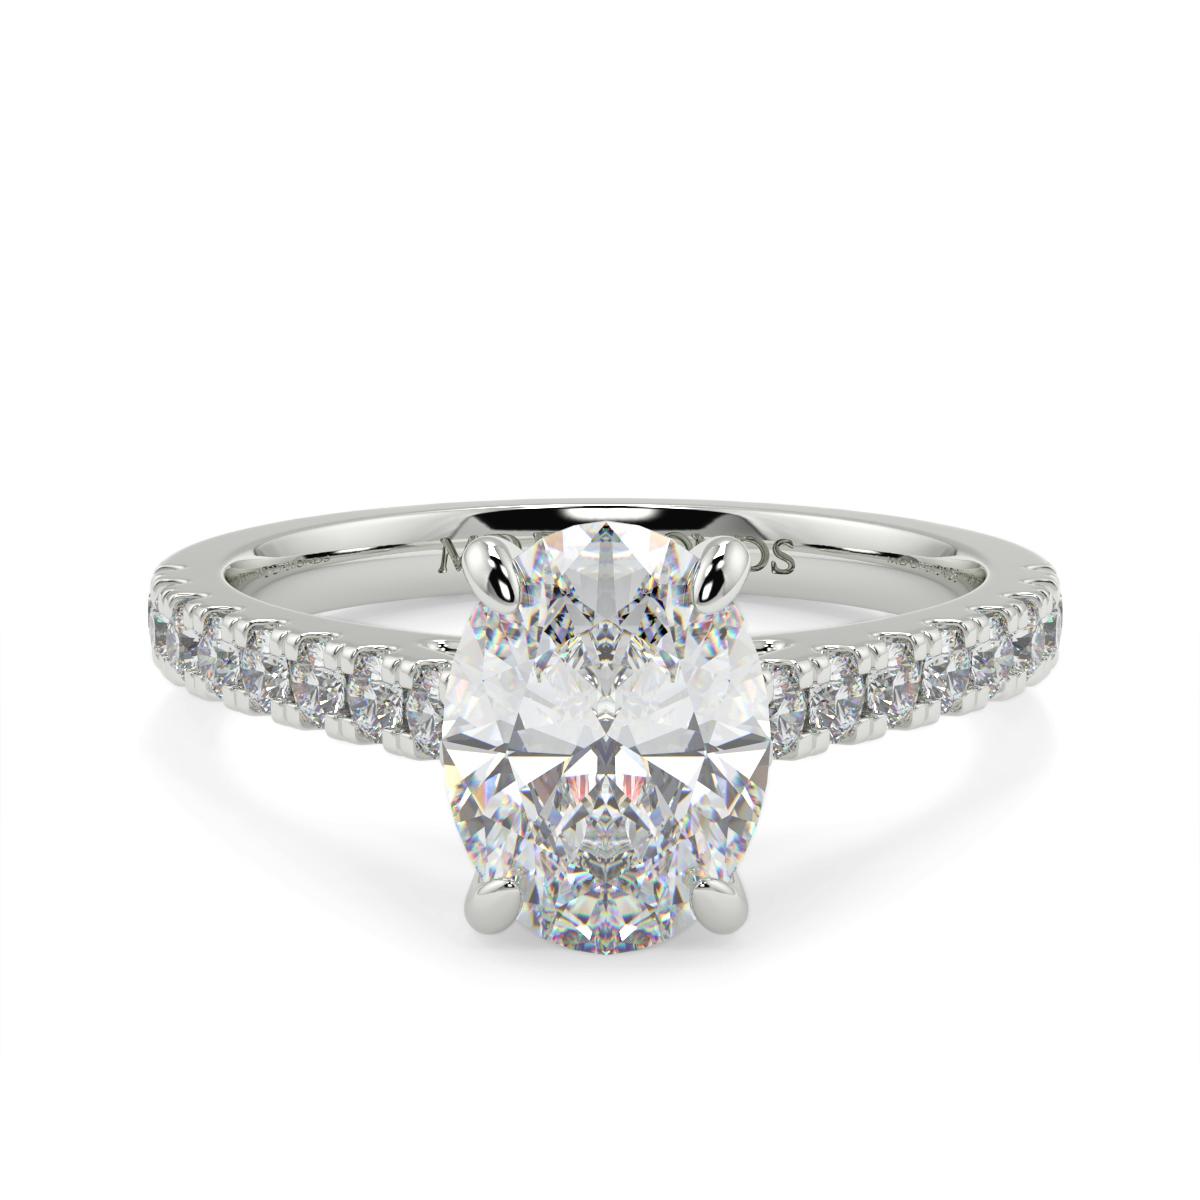 Oval Microset Diamond Ring